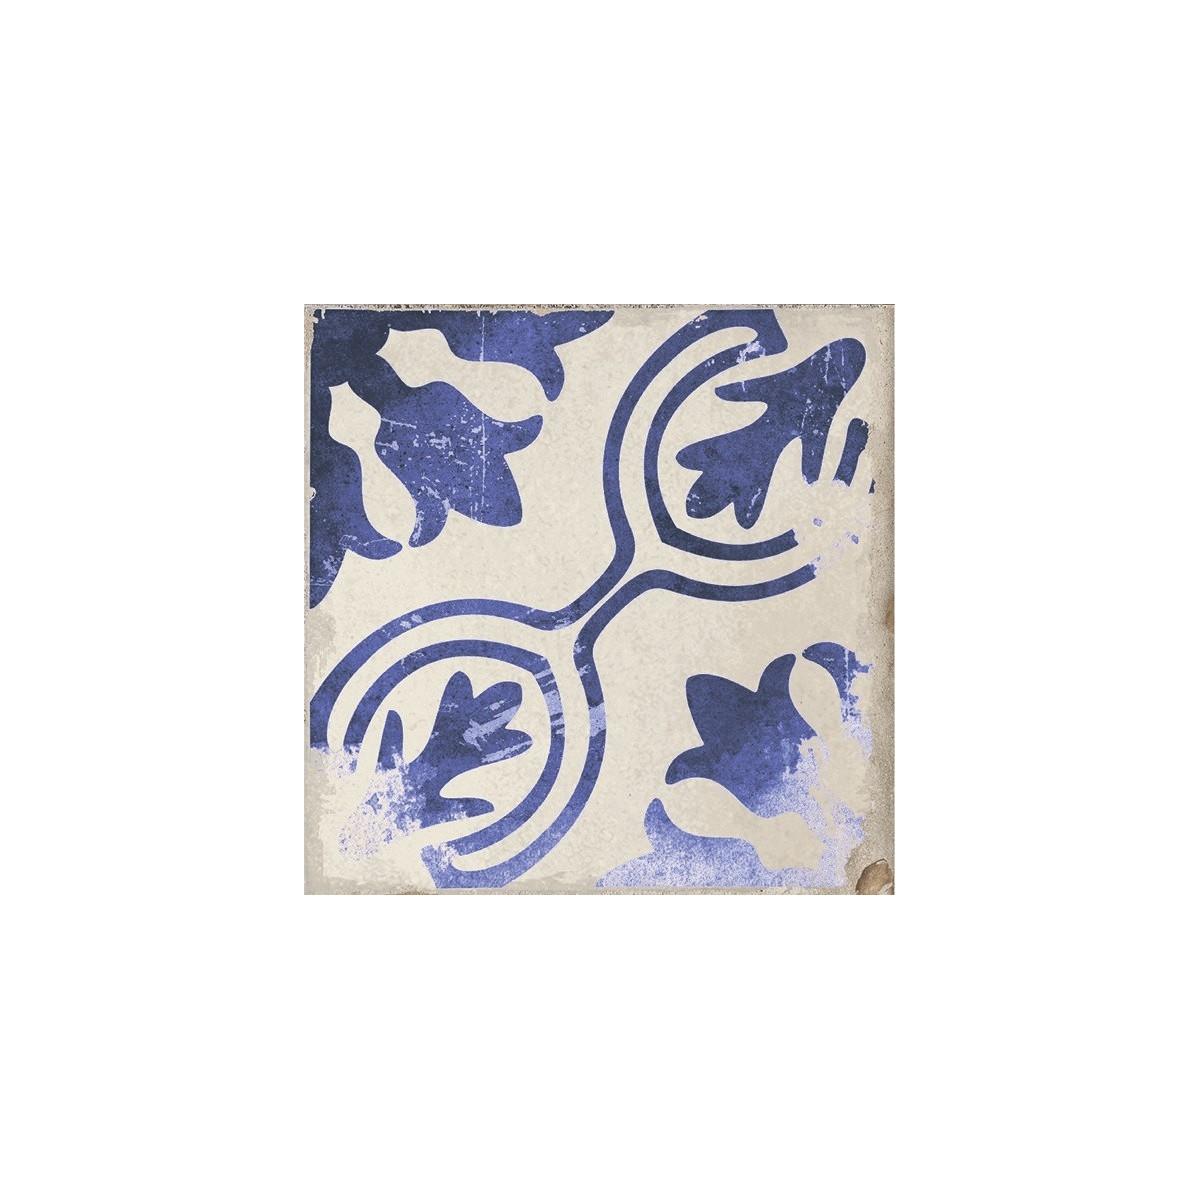 Iruela Blue 15x15 (caja 0,5 m2) - Serie Village - Marca APE